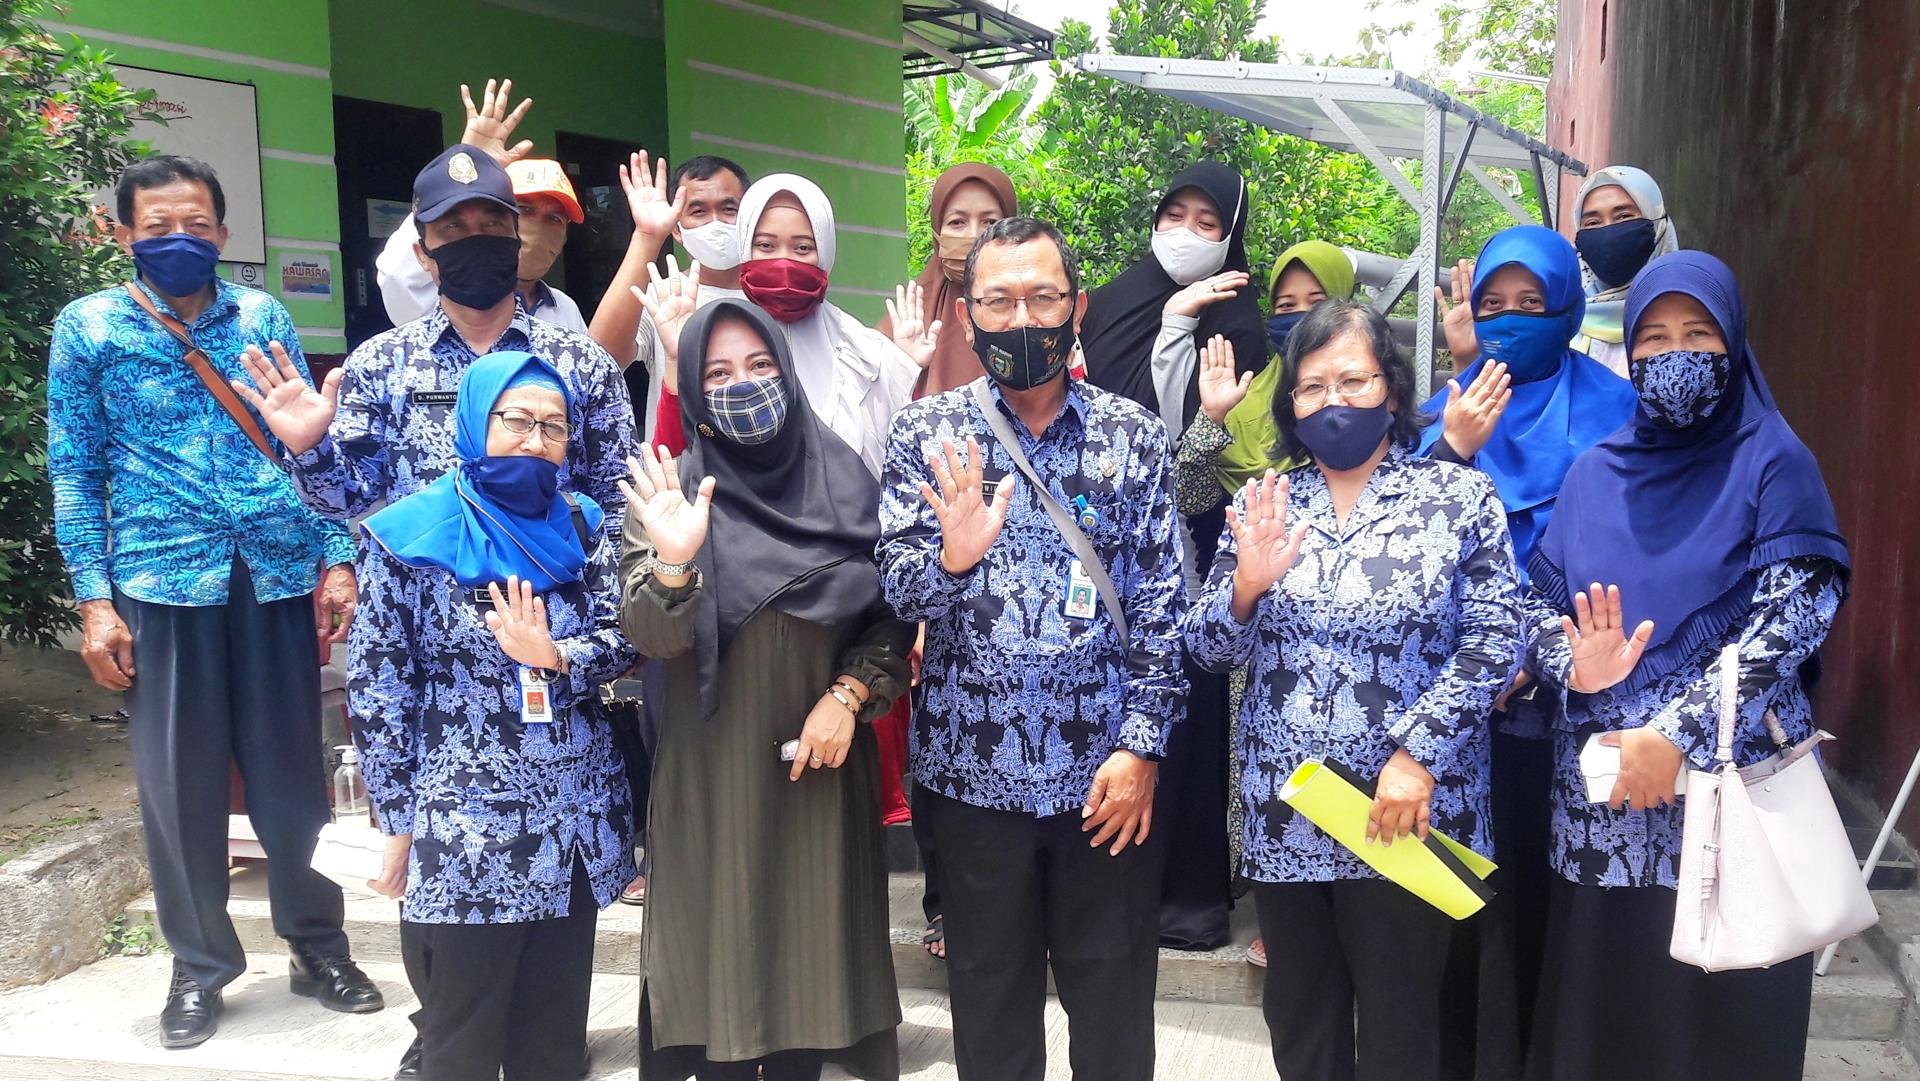 Pelatihan Hidroponik Di Kampung Tangguh Semeru Kelurahan Josenan